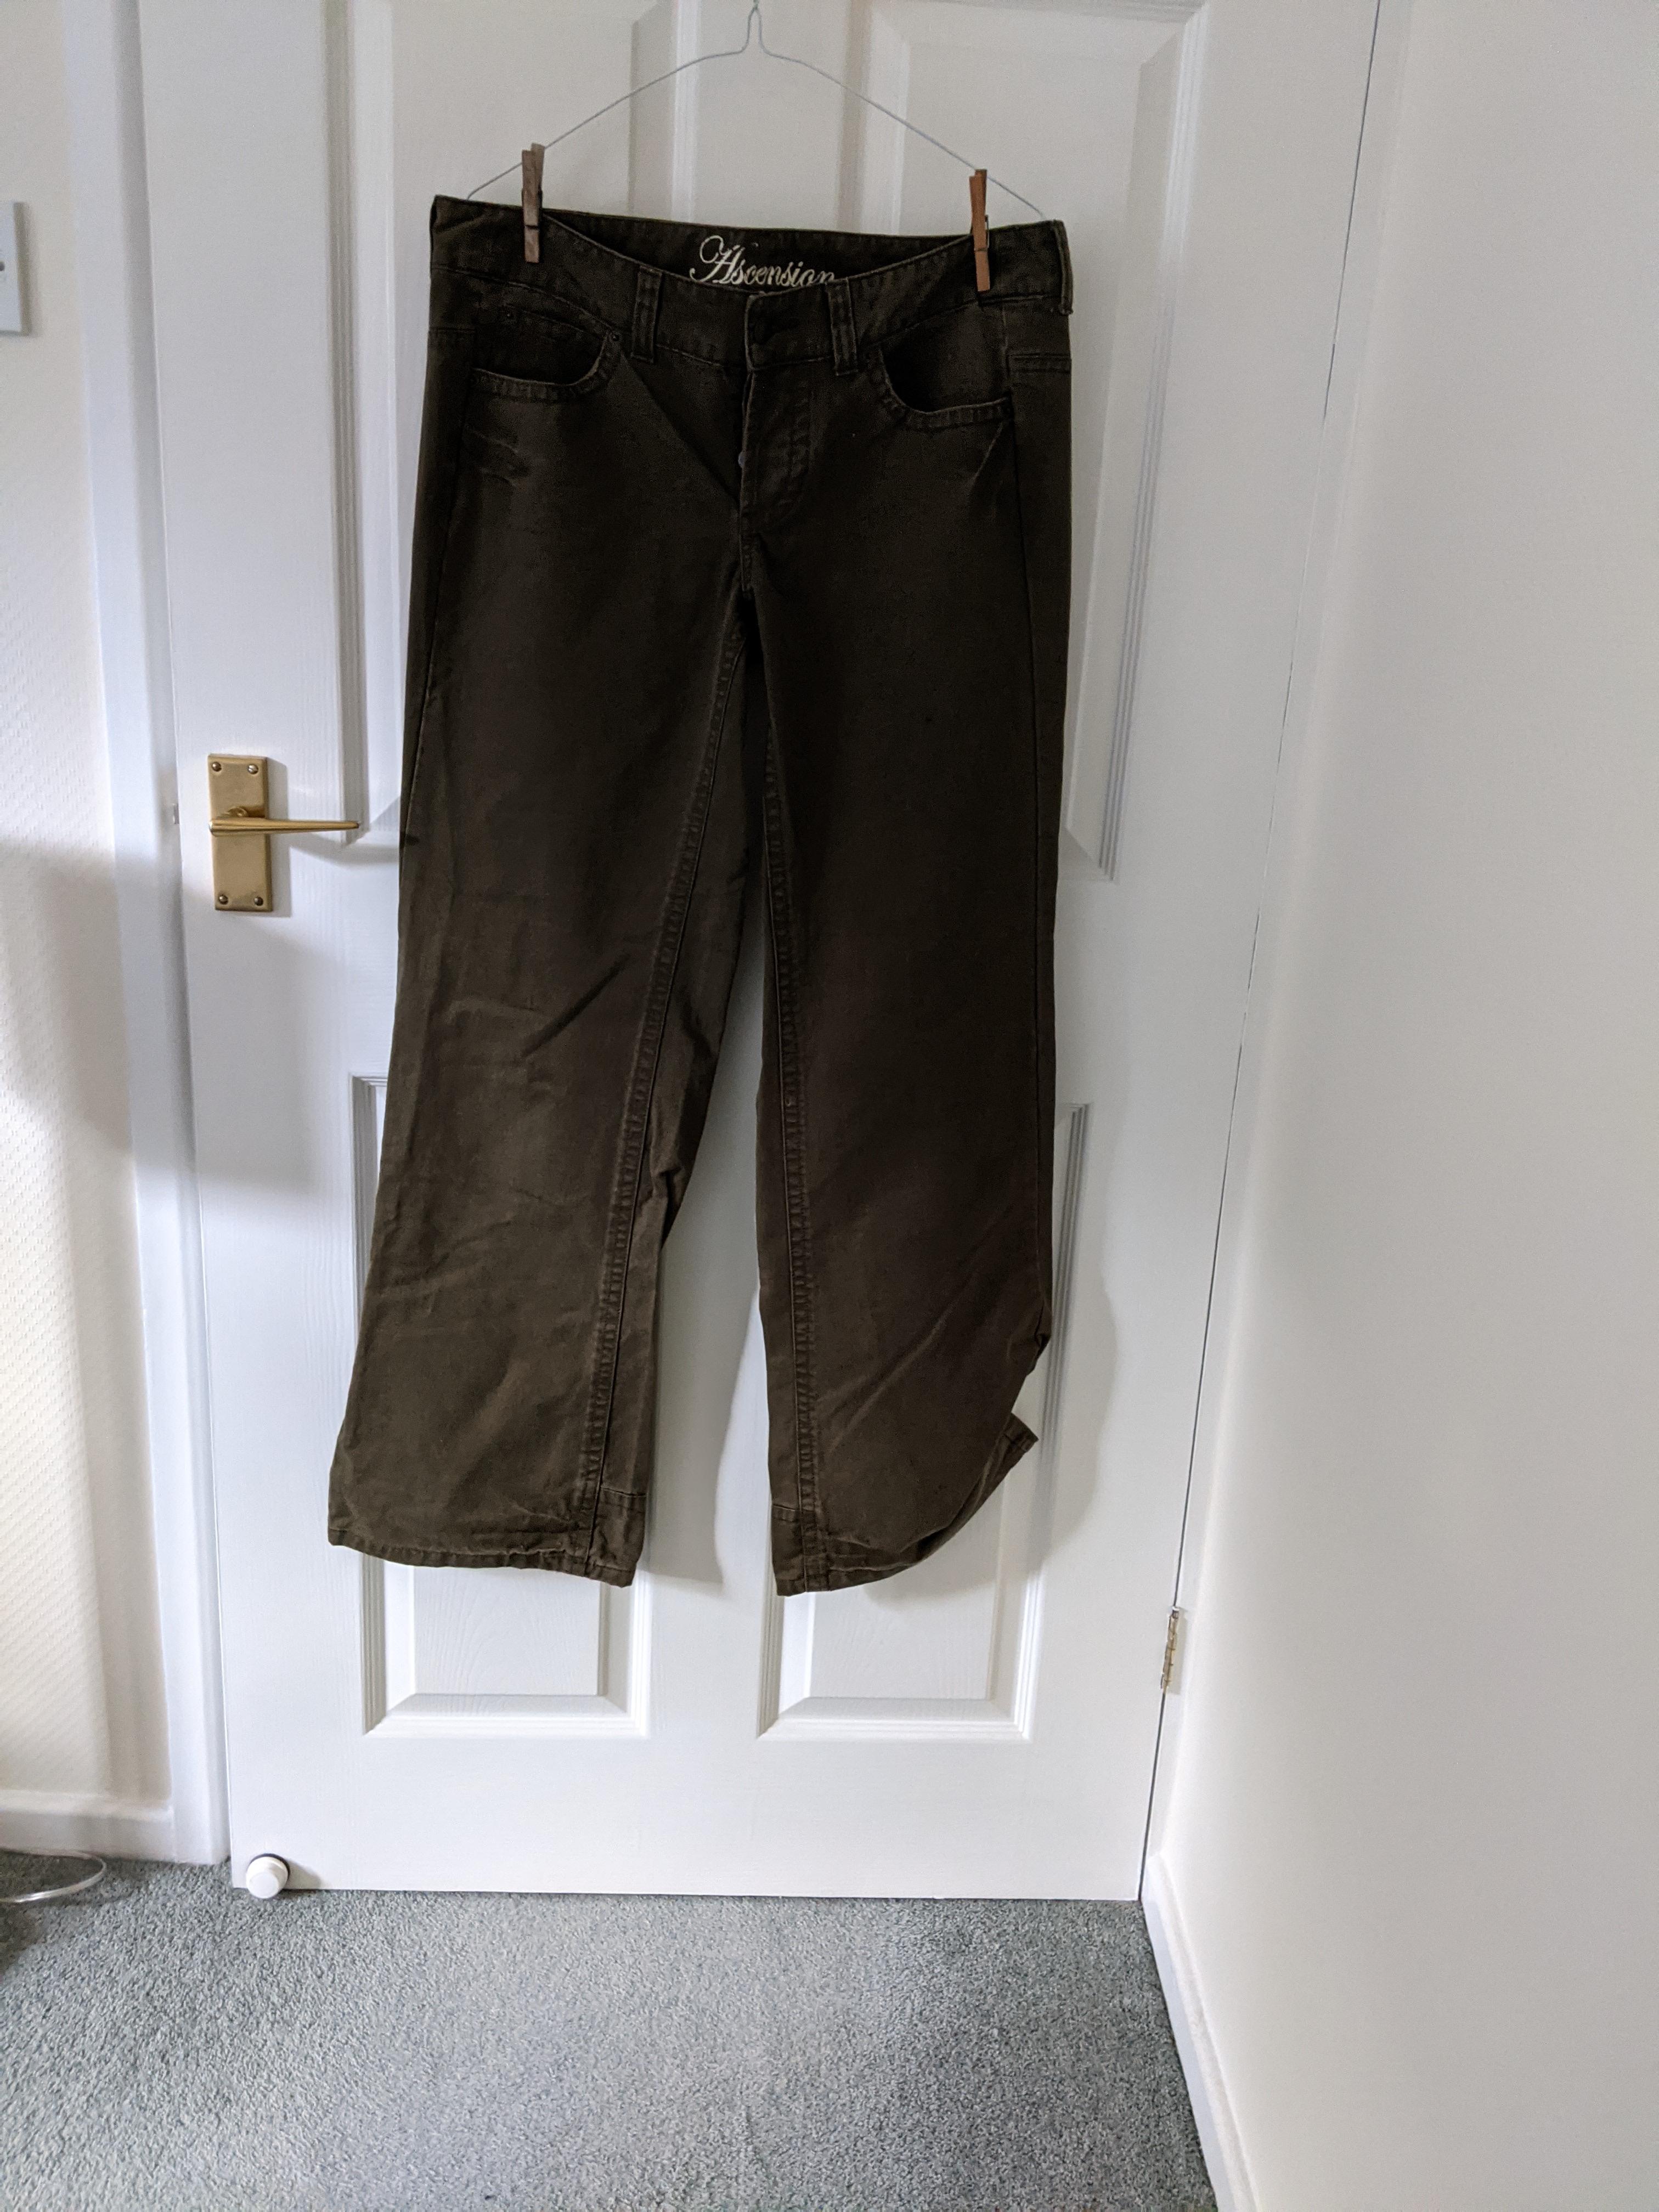 Image of Ascension Olive green jeans